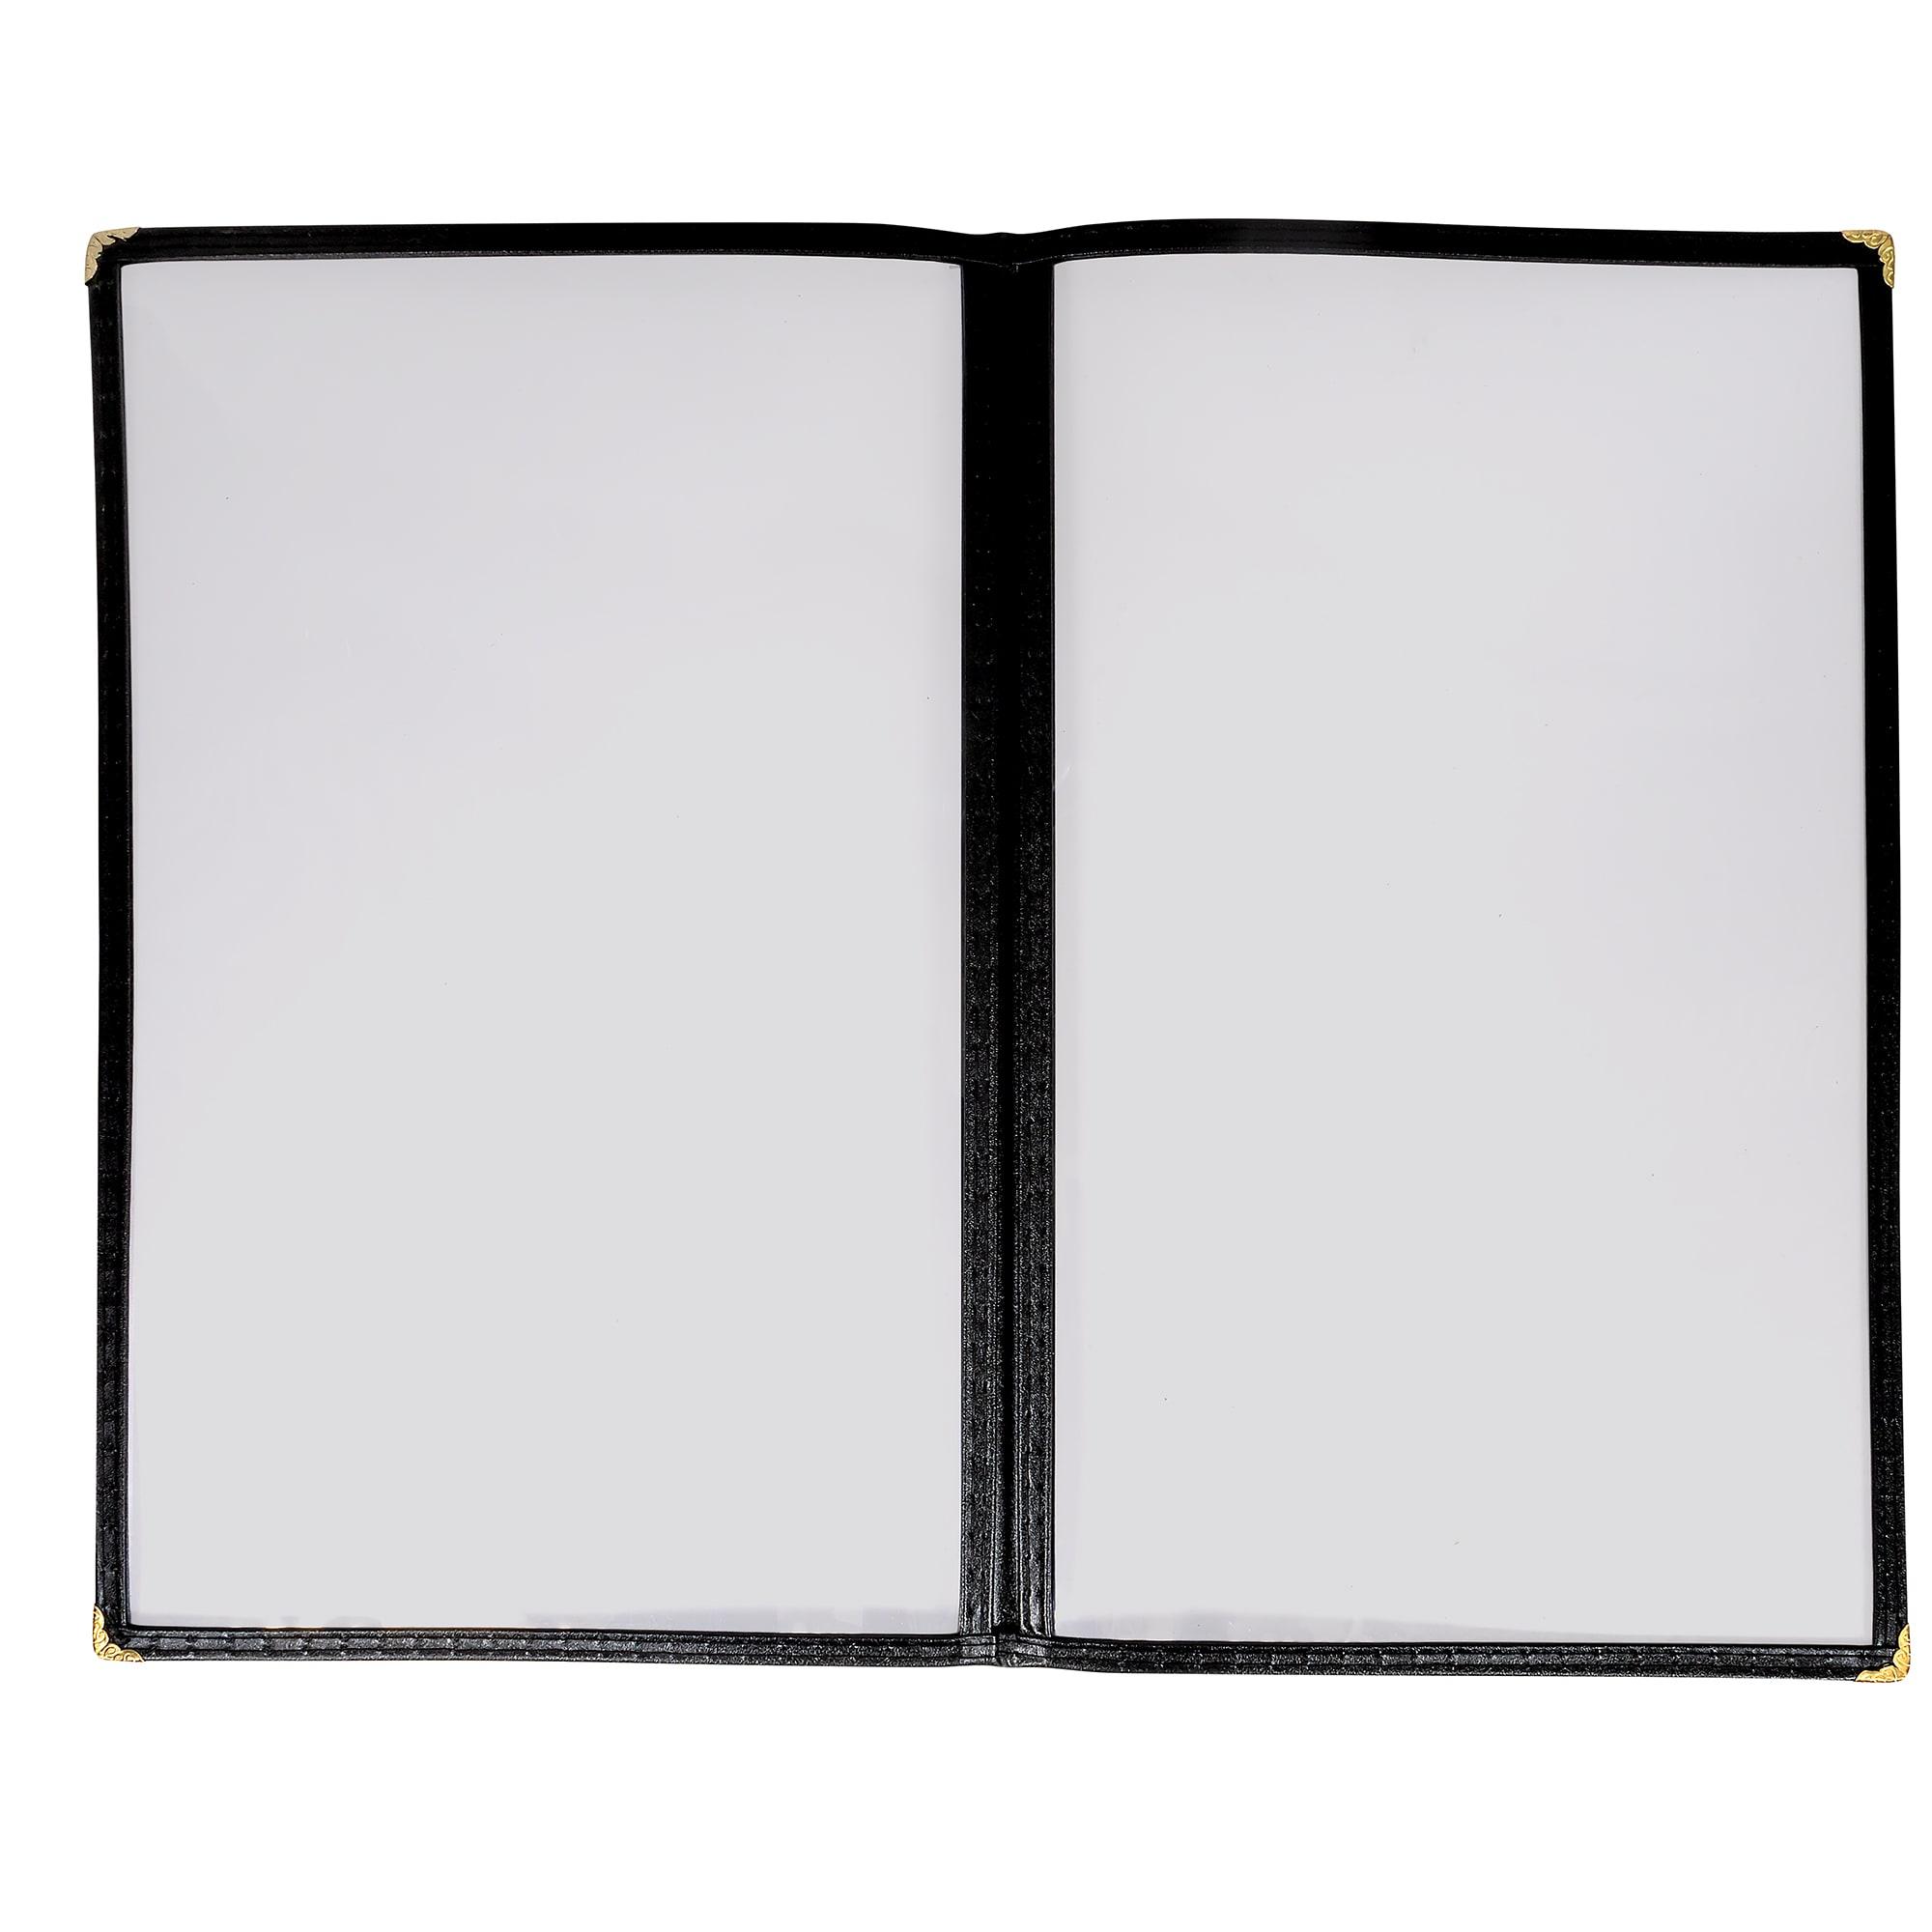 "Winco PMCD-14K Double-Fold Menu Cover, 8.5 x 14"", Black"